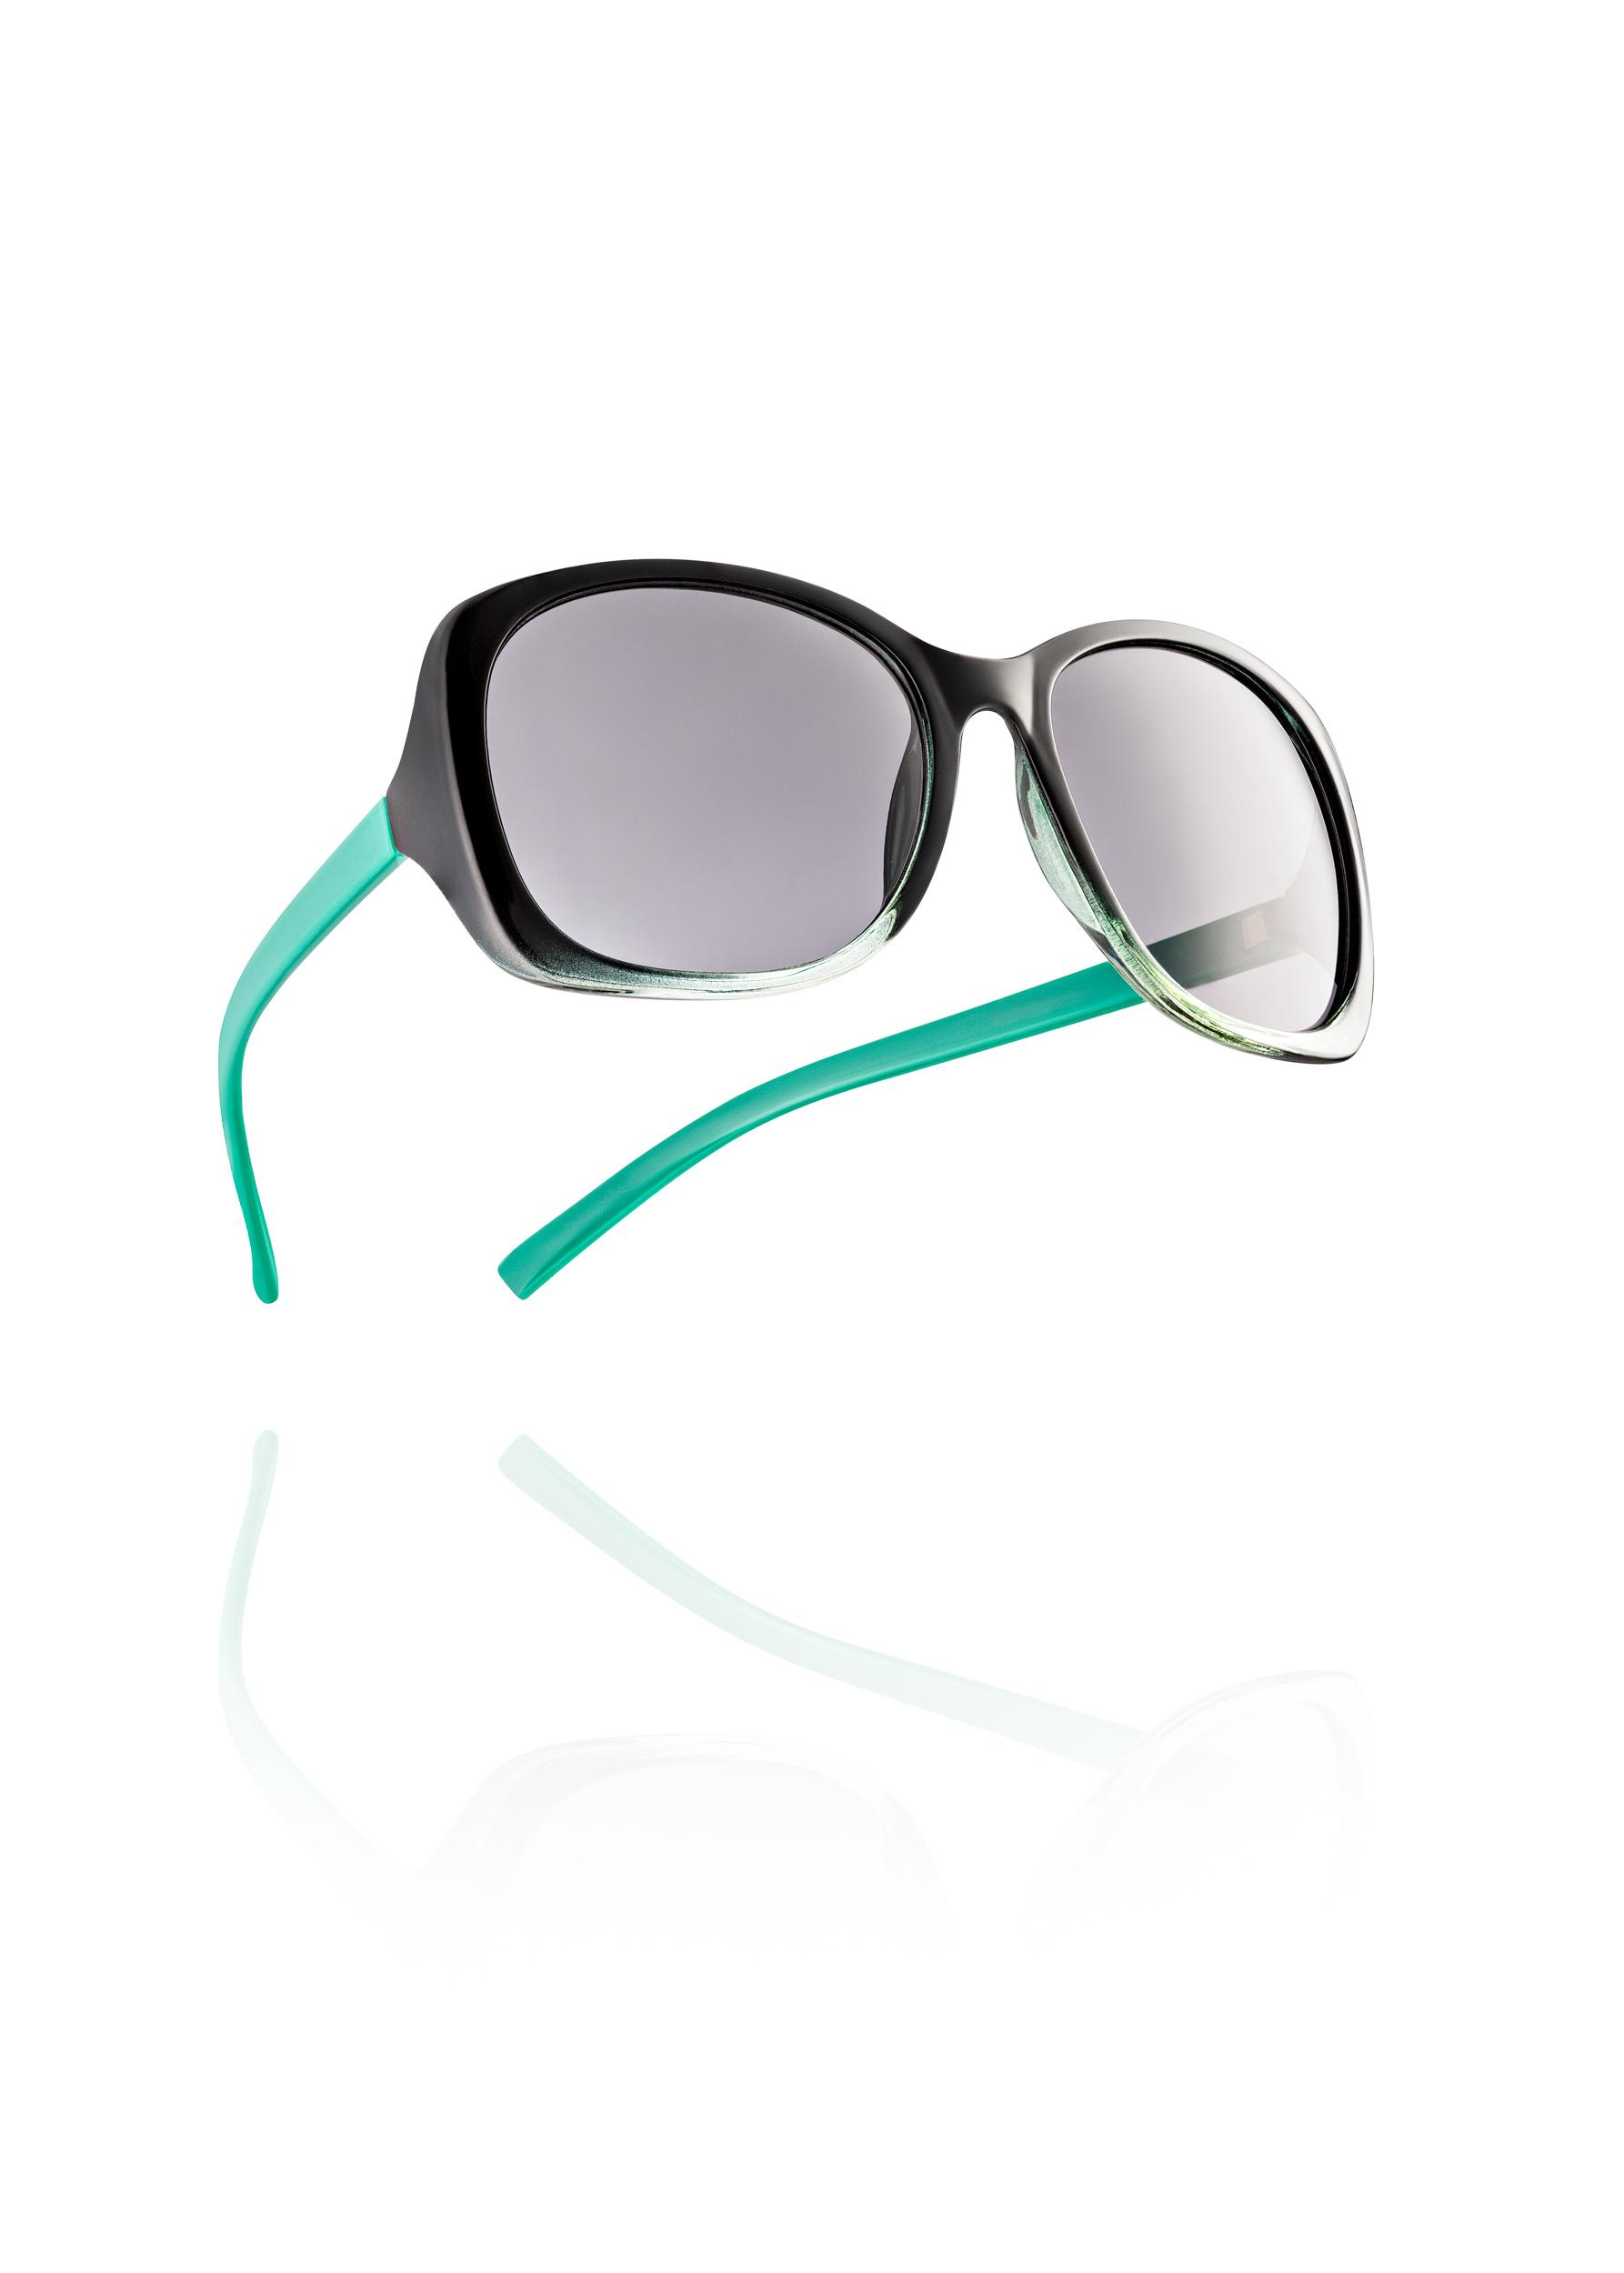 Neal Byrne Photography-Glasses Float Comp.jpg